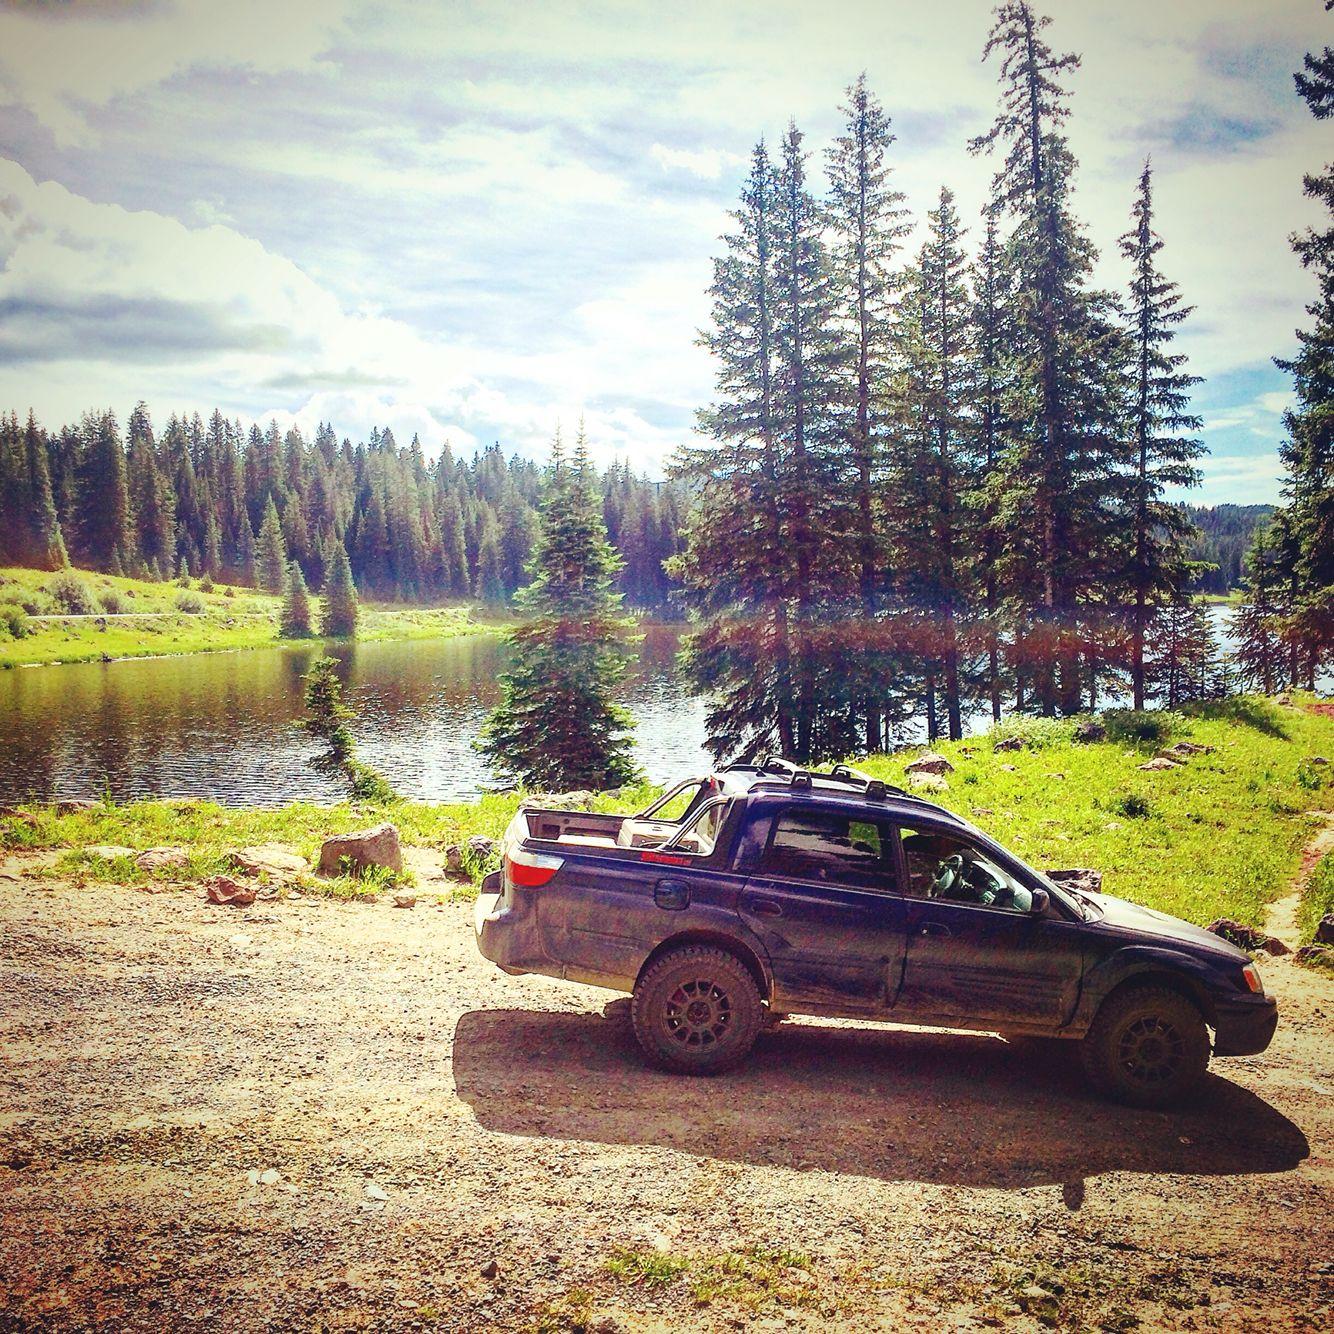 Lifted Outback Sport >> Best 25+ Subaru baja ideas on Pinterest | Lifted subaru, Subaru outback lifted and Subaru ...